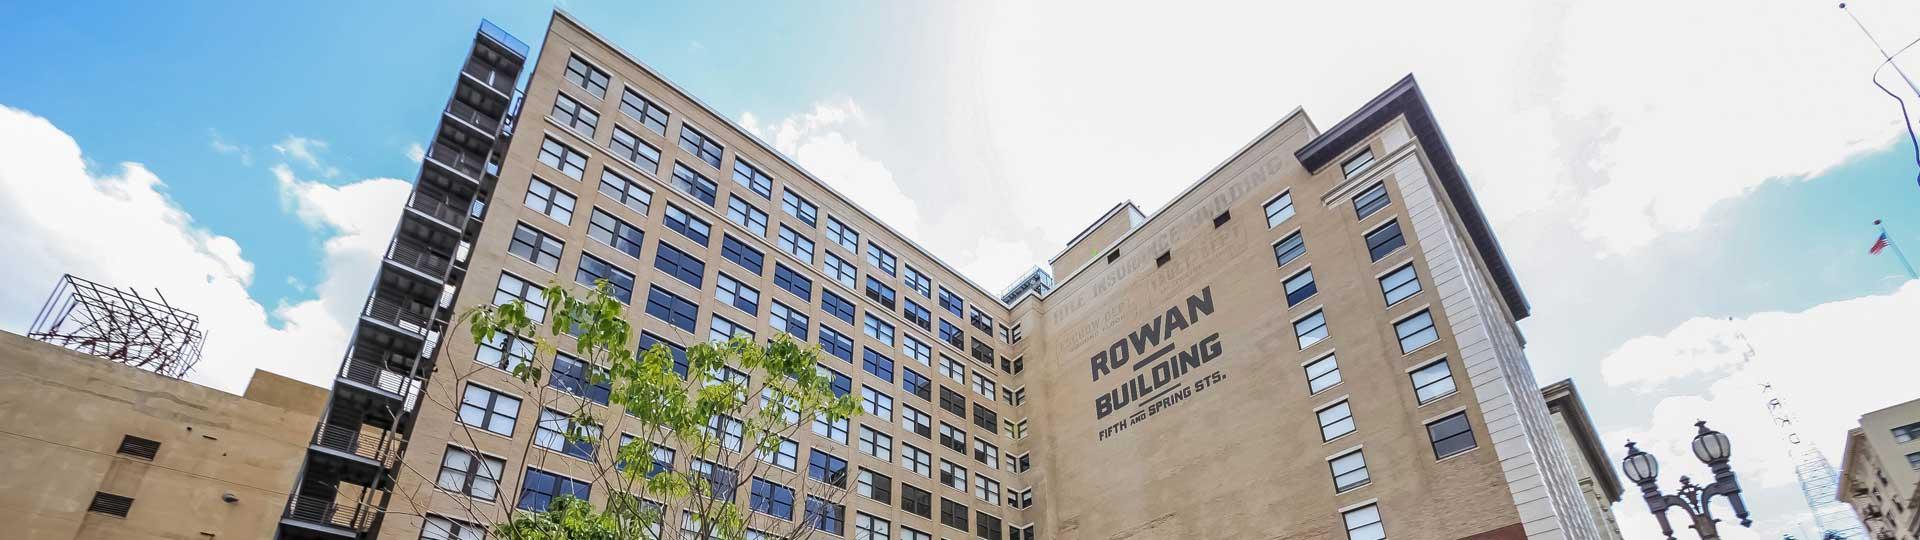 The Rowan Lofts